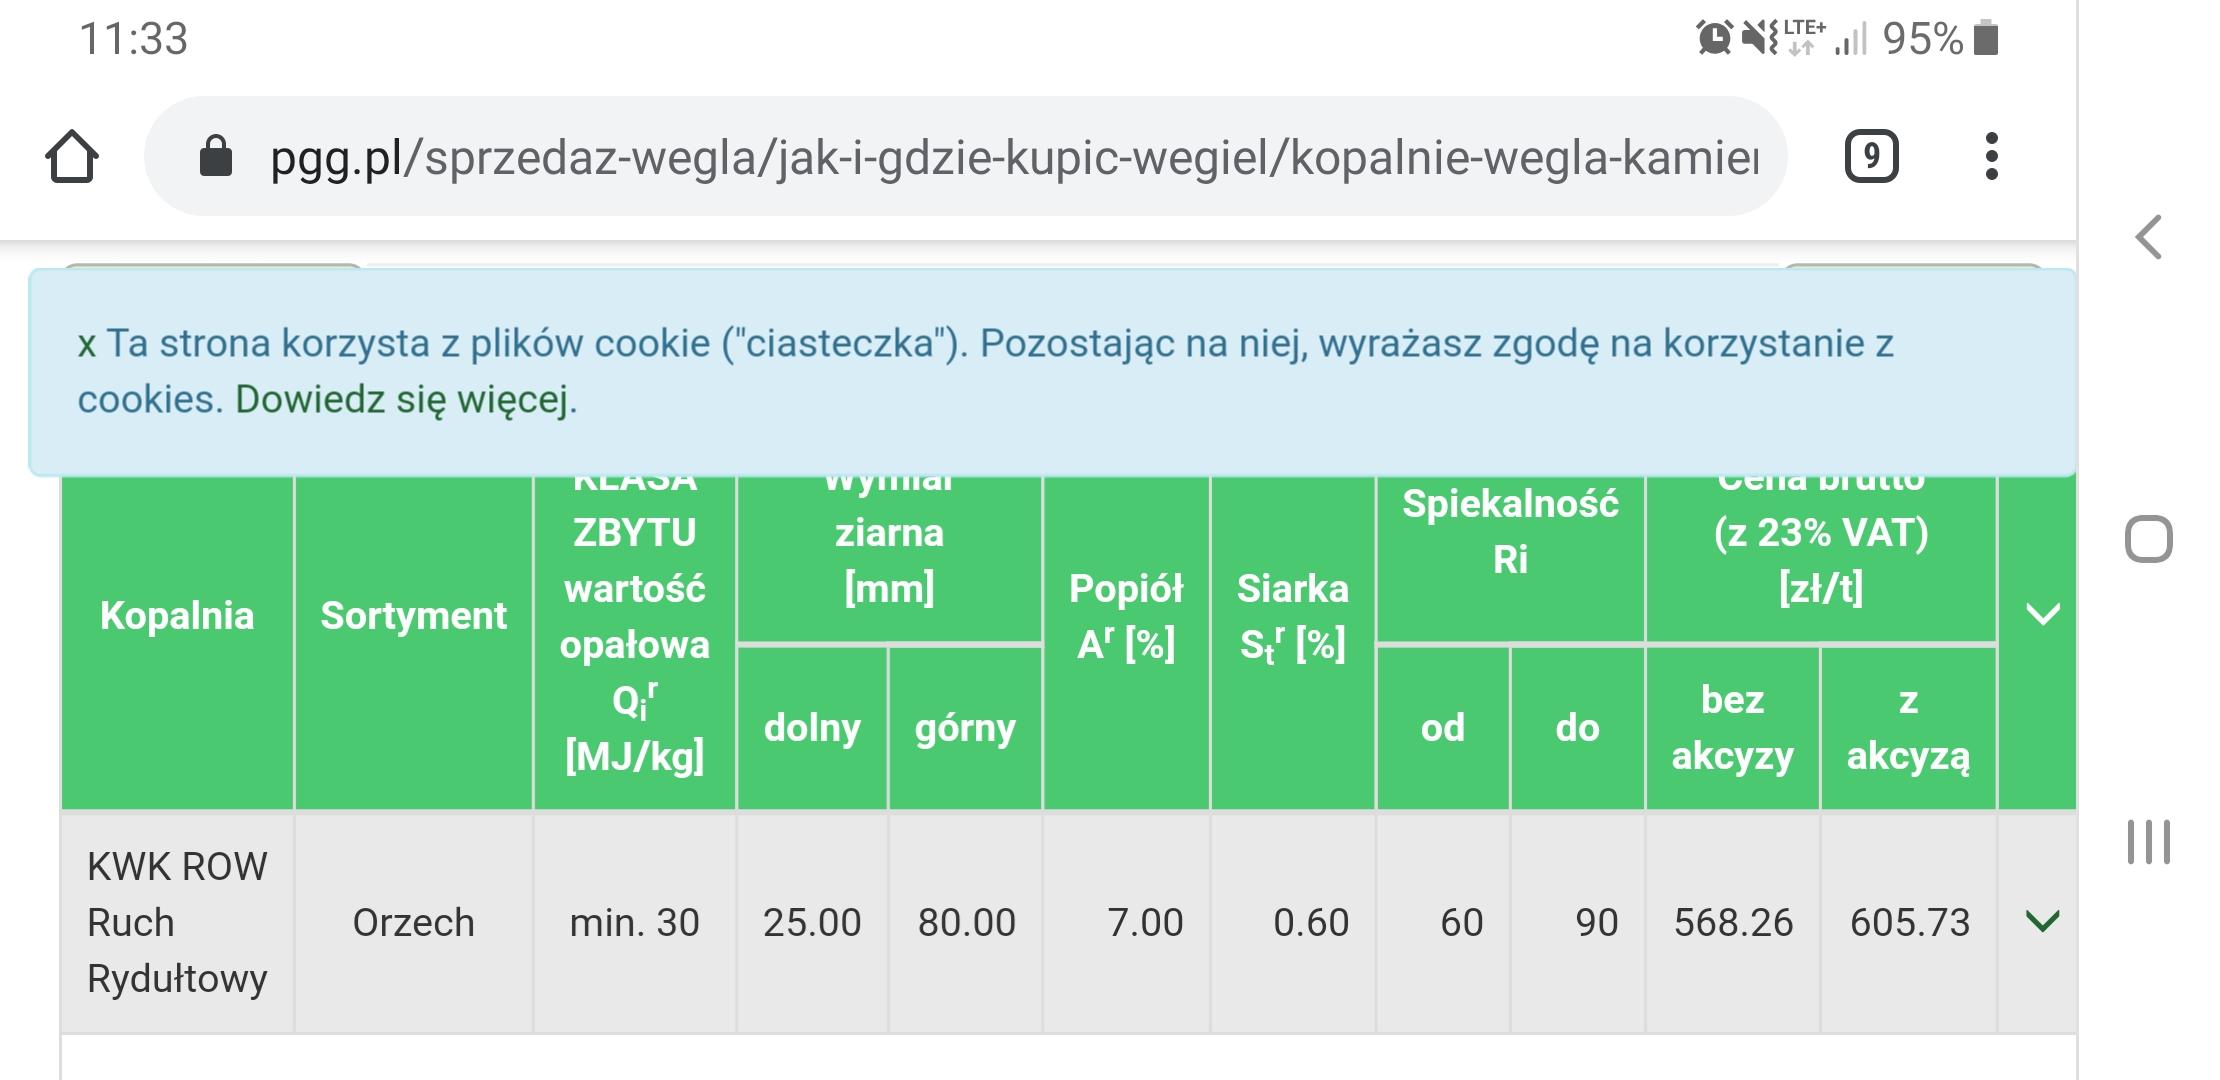 Śląskie - bardzo dobre ceny węgla na kopalniach PGG. 568 zł za tonę